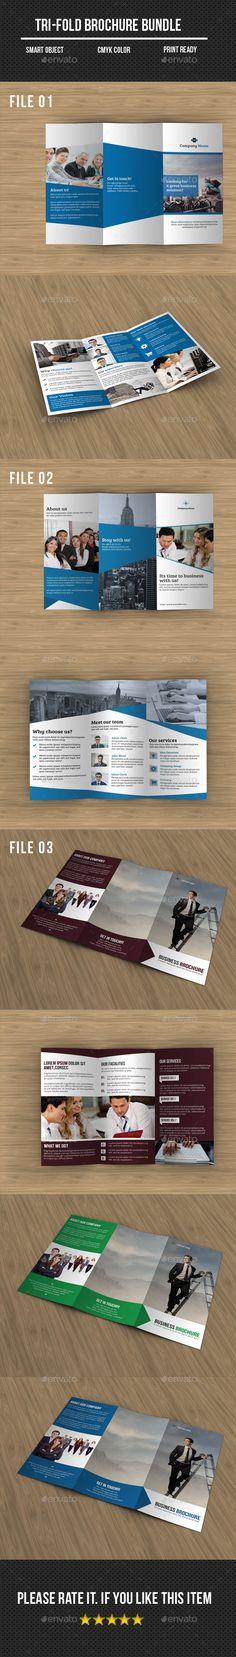 Corporate Tri- Fold Brochure Bundle - Corporate Brochure Template PSD. Download here: http://graphicriver.net/item/corporate-tri-fold-brochure-bundle/11694985?s_rank=1791&ref=yinkira